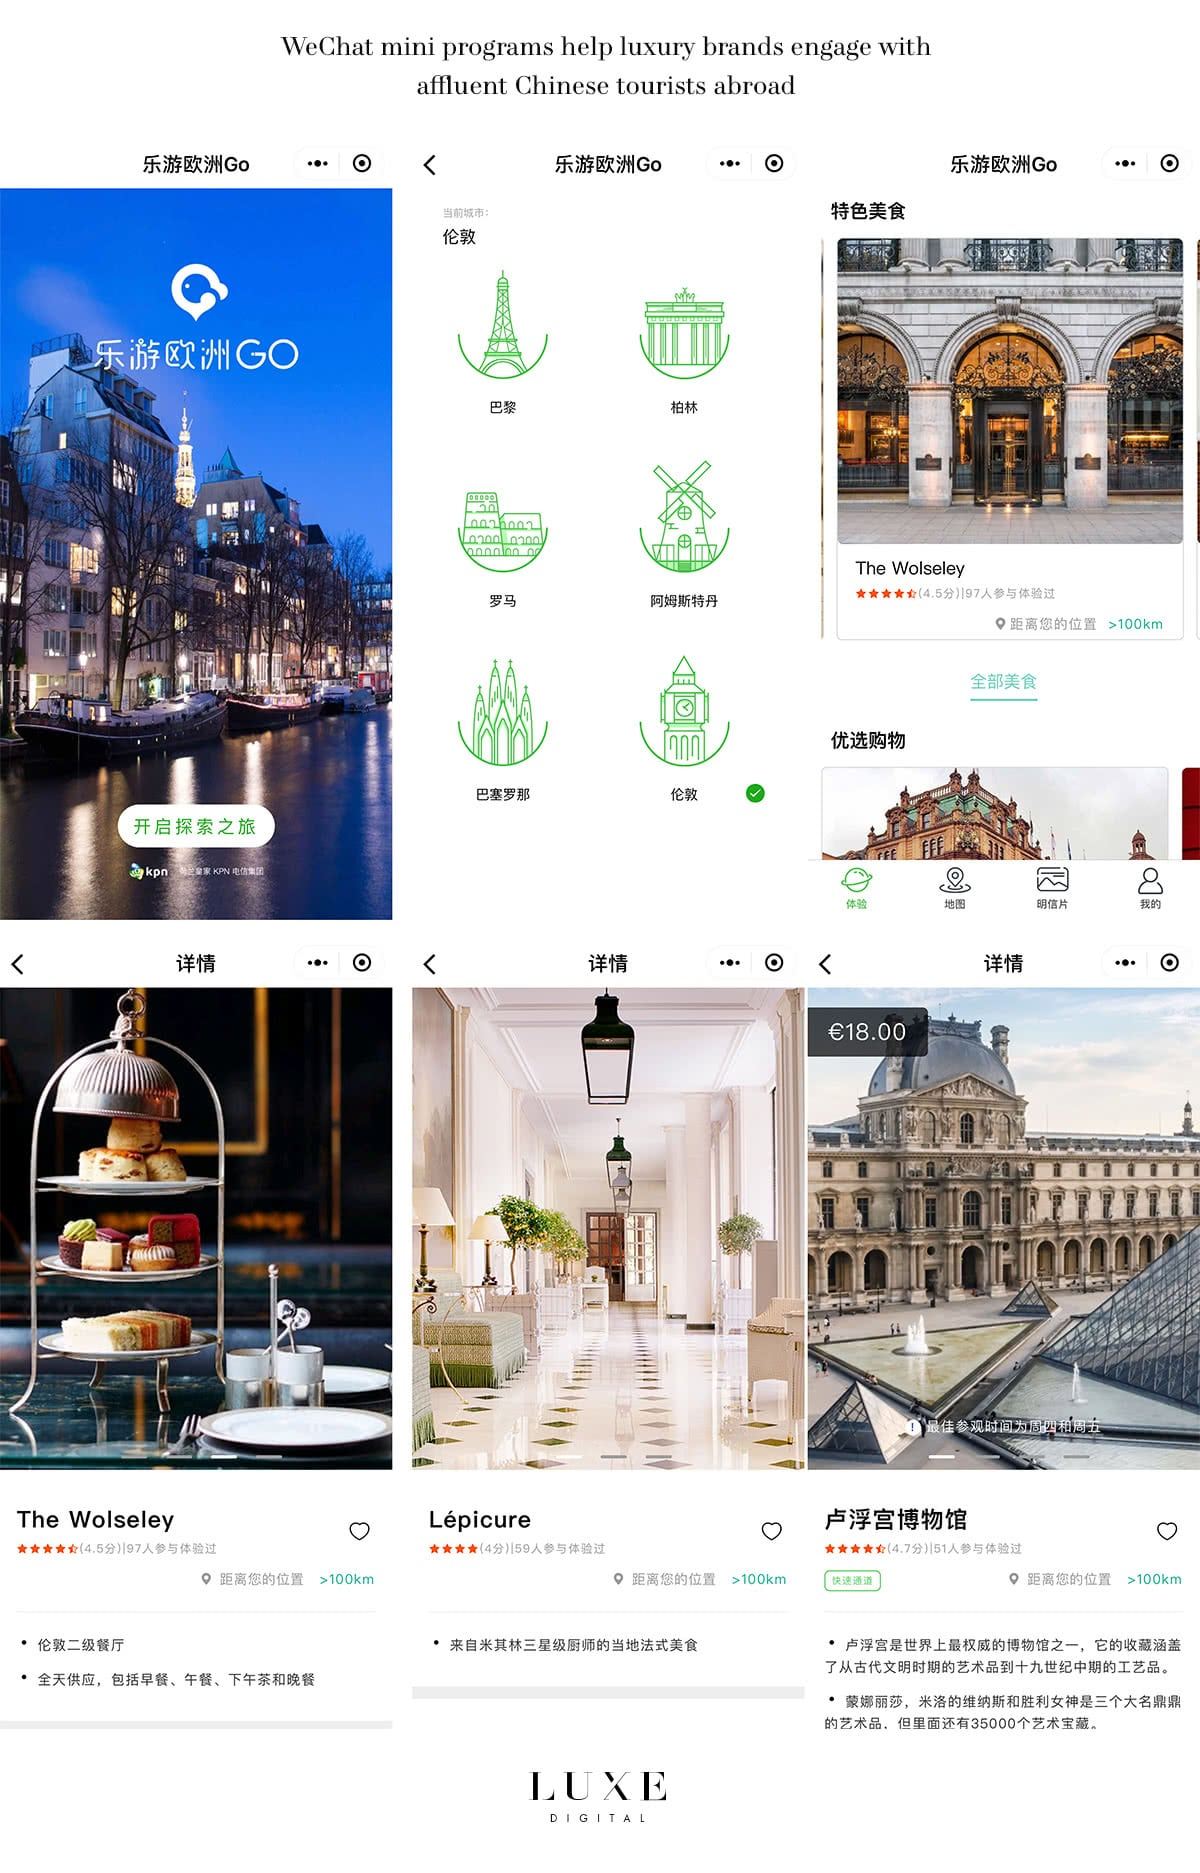 Luxe Digital luxury China WeChat mini-program Go Explore Europe